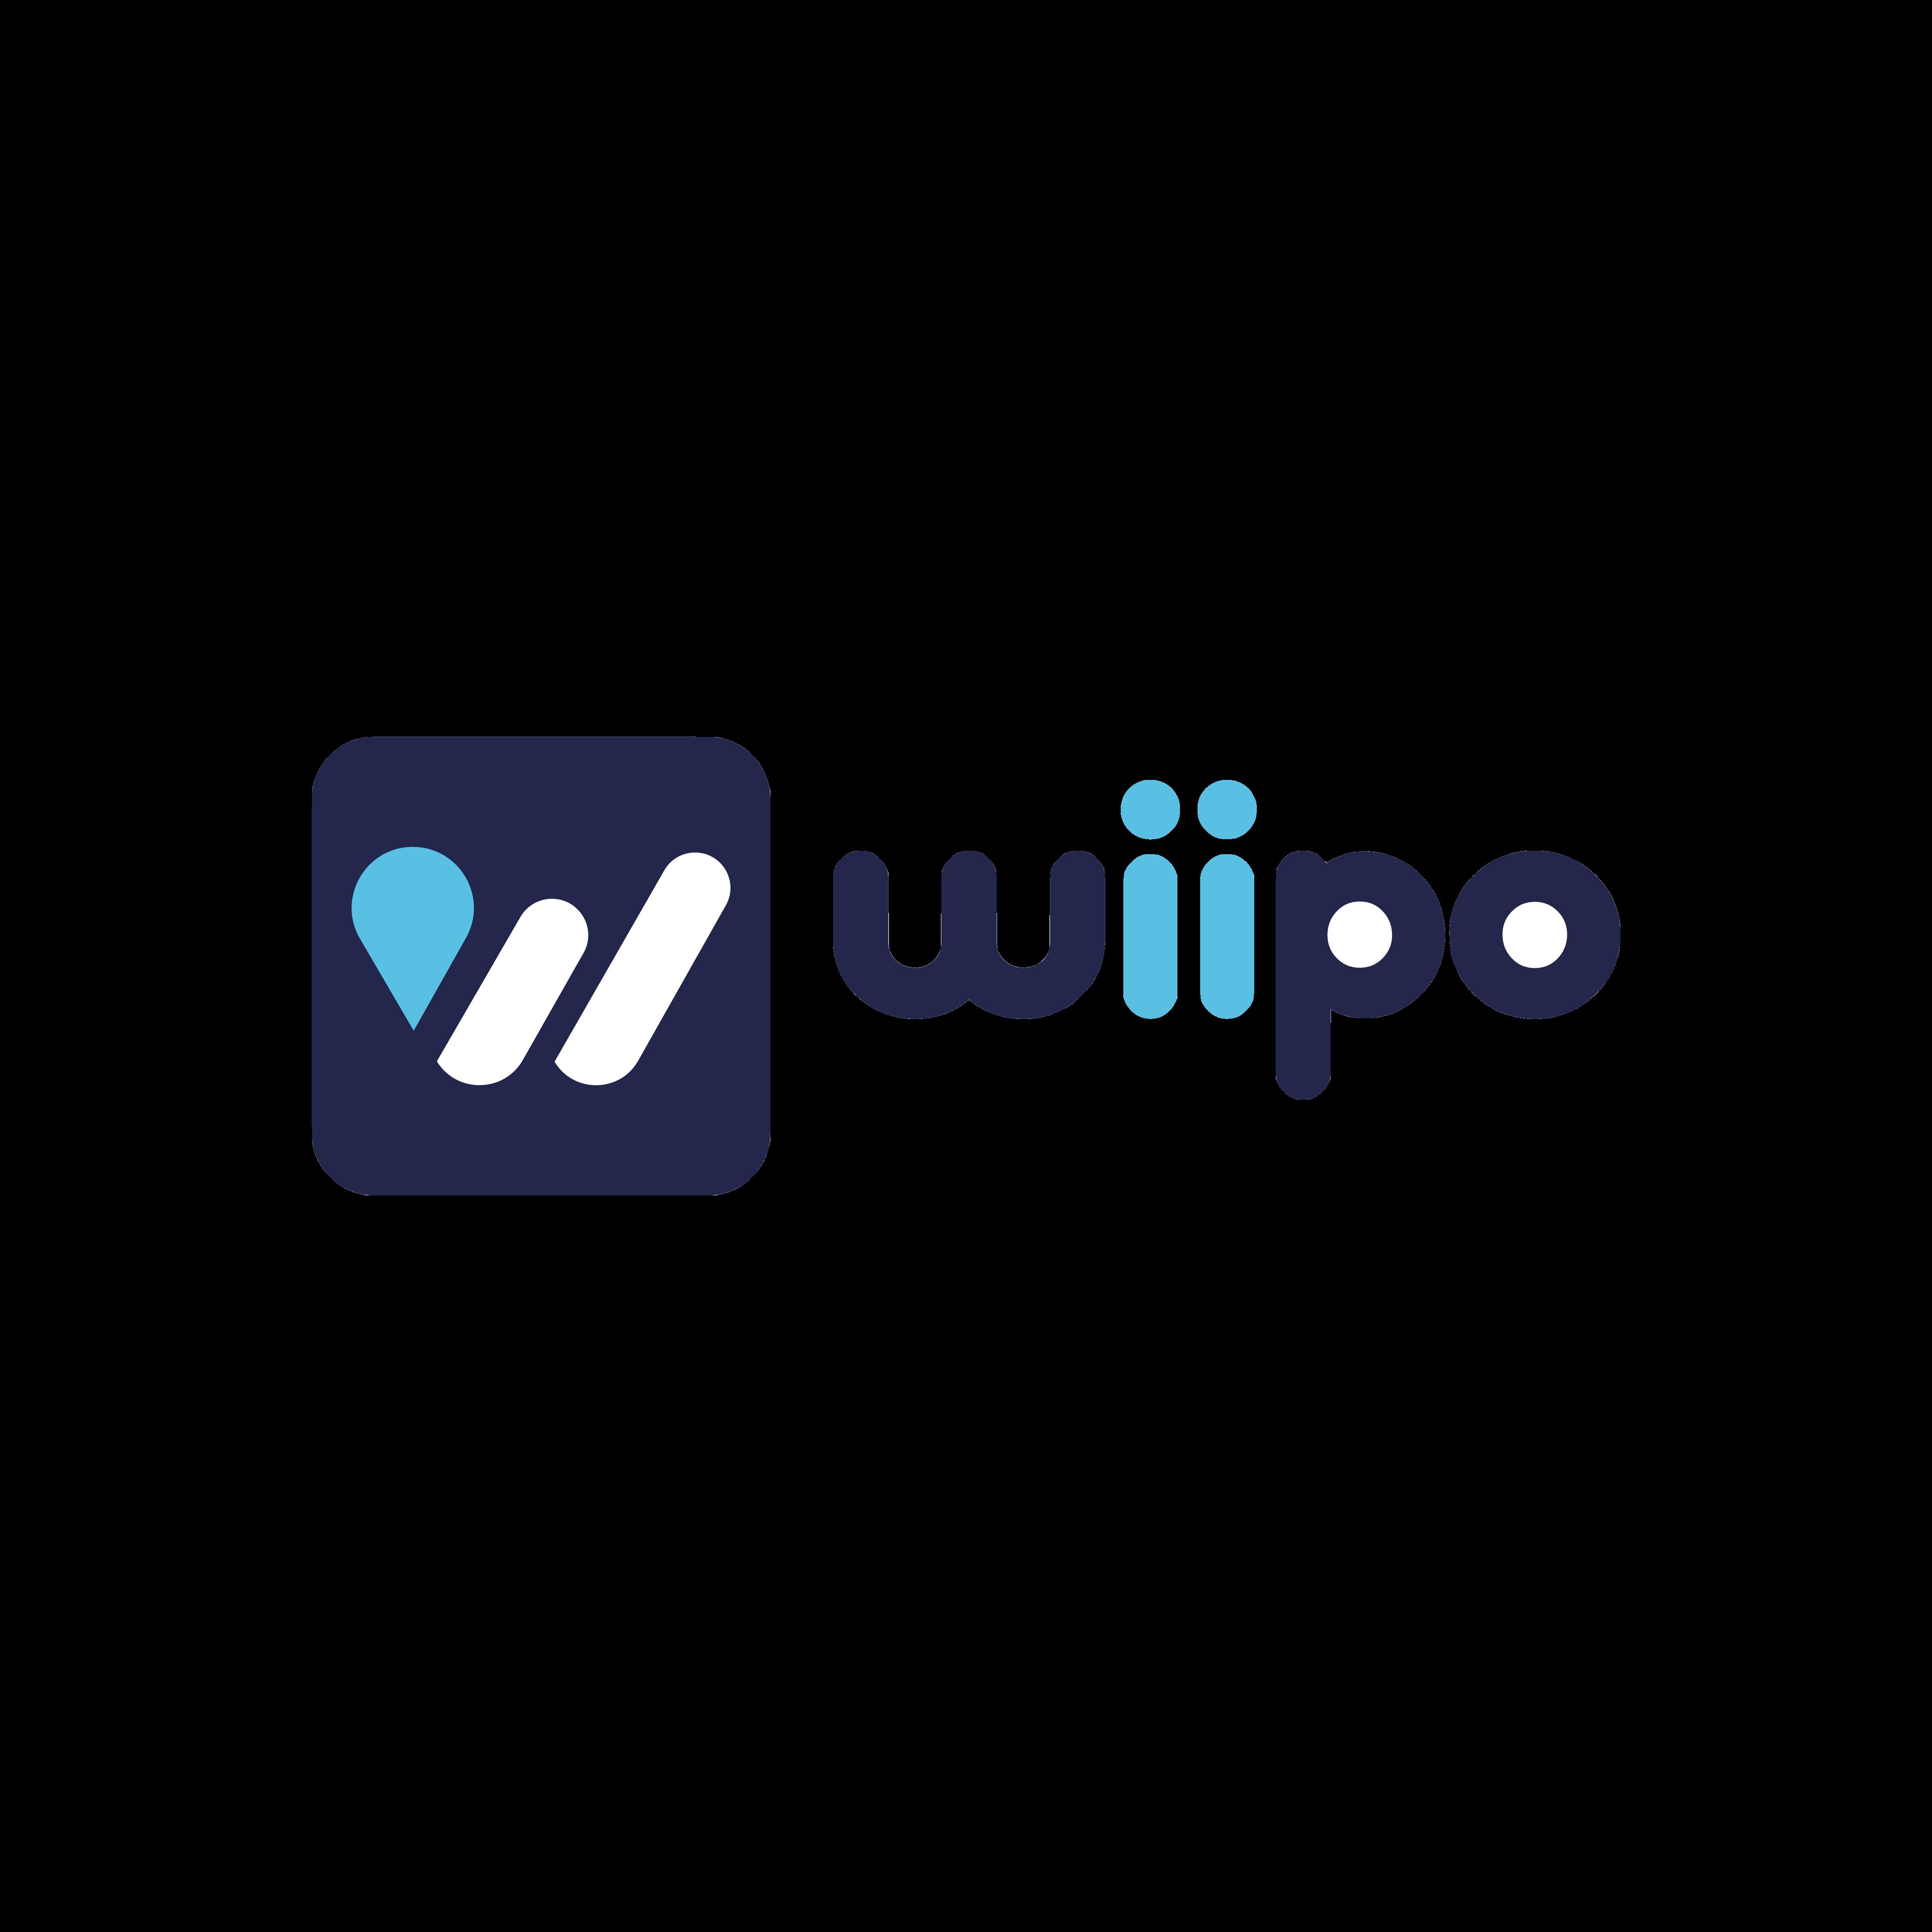 wiipo